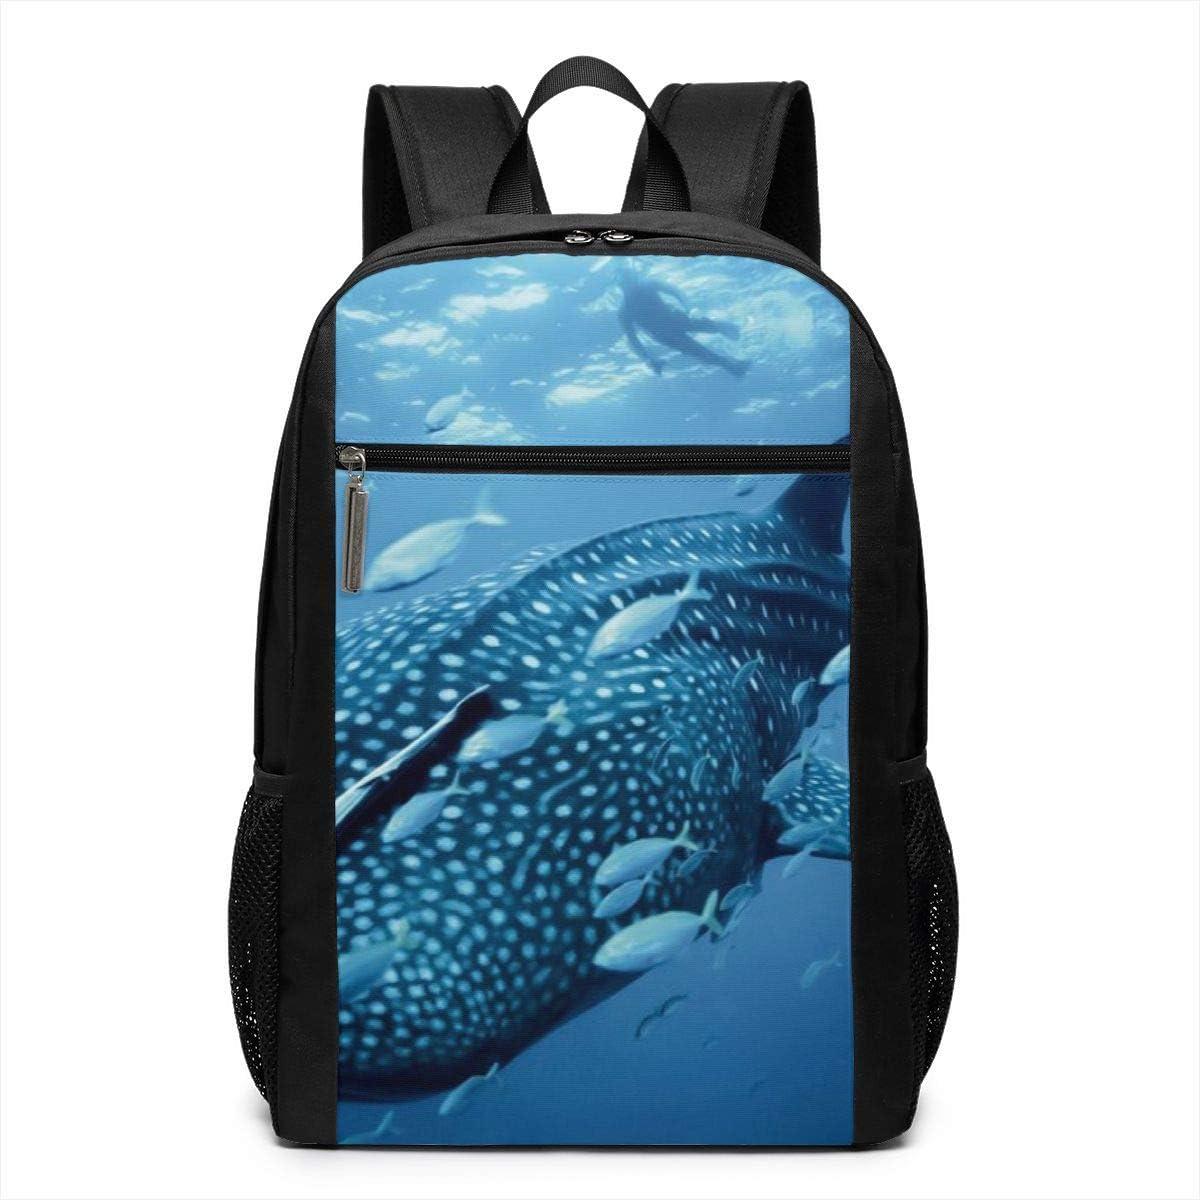 Oxford Unisex Travel Business Superbreak Daypack Whale Shark Slim Laptop School Bags Adult Casual Backpack